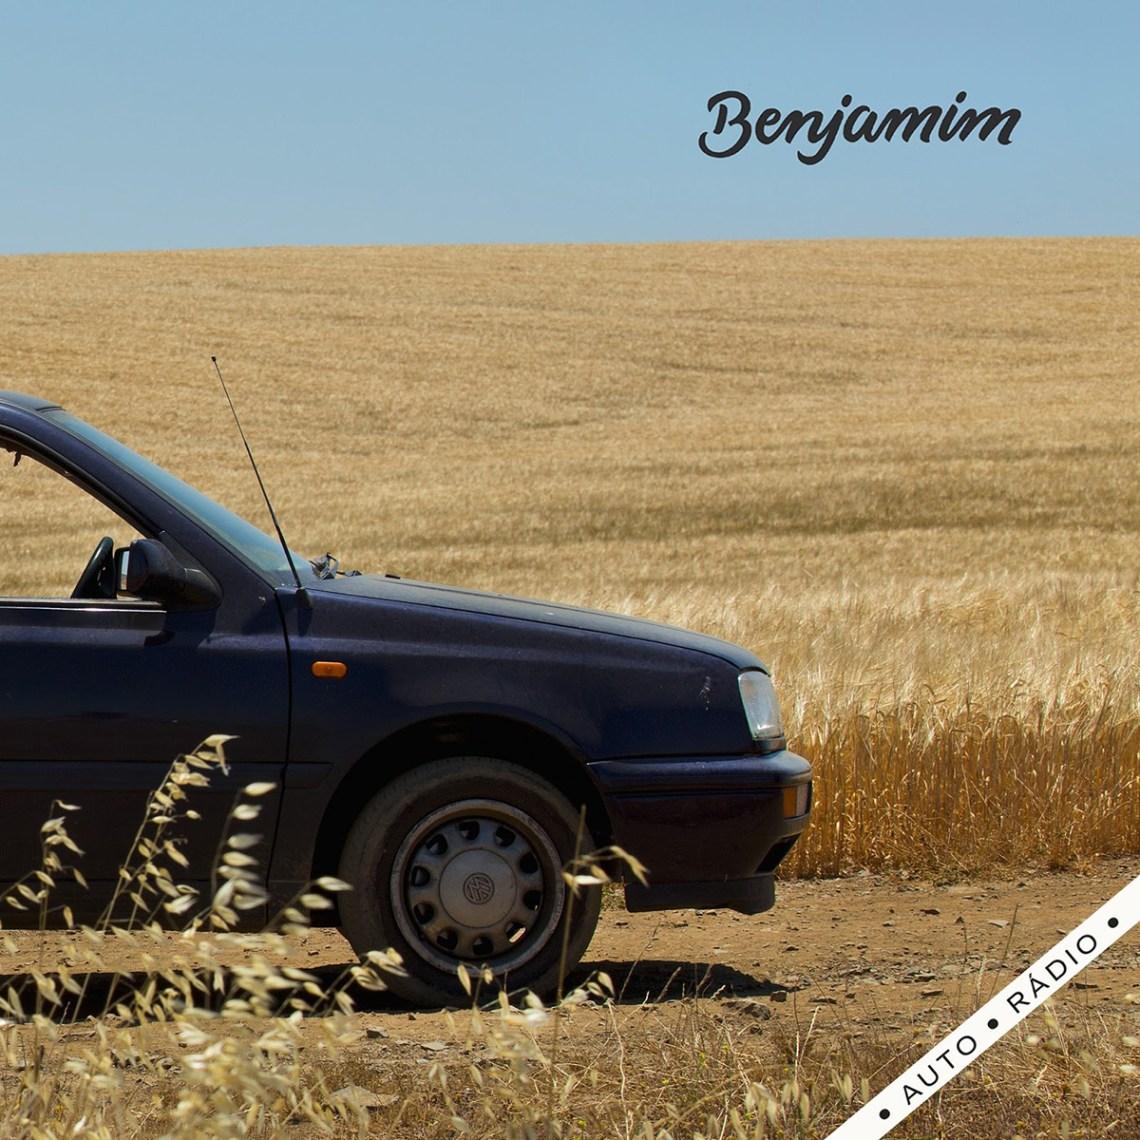 benjamim-autoradio-capa